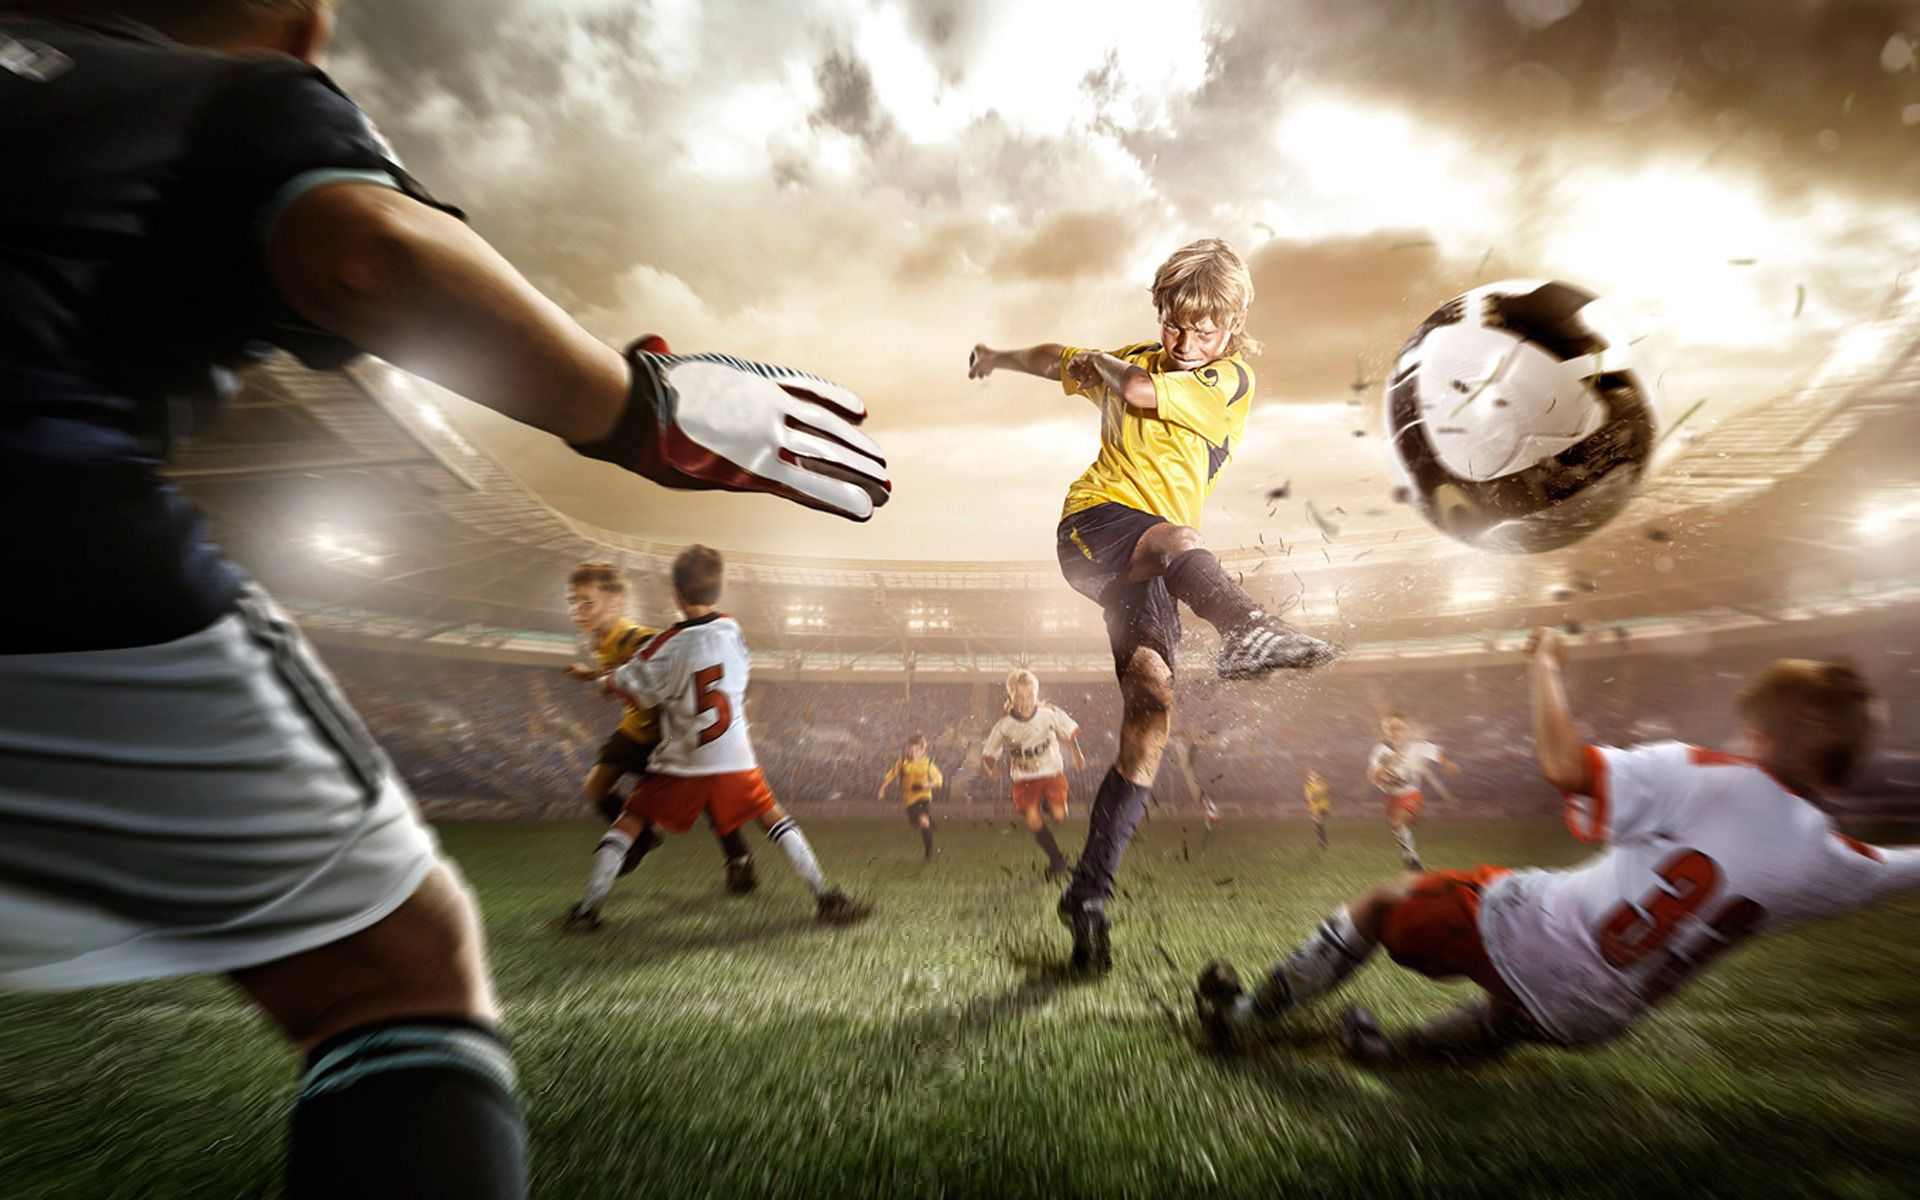 Kids Football Wallpaper Http Wallpaperzoo Com Kids Football Wallpaper 18477 Html Kidsfootball Sports Wallpapers Kids Sports Football Kids